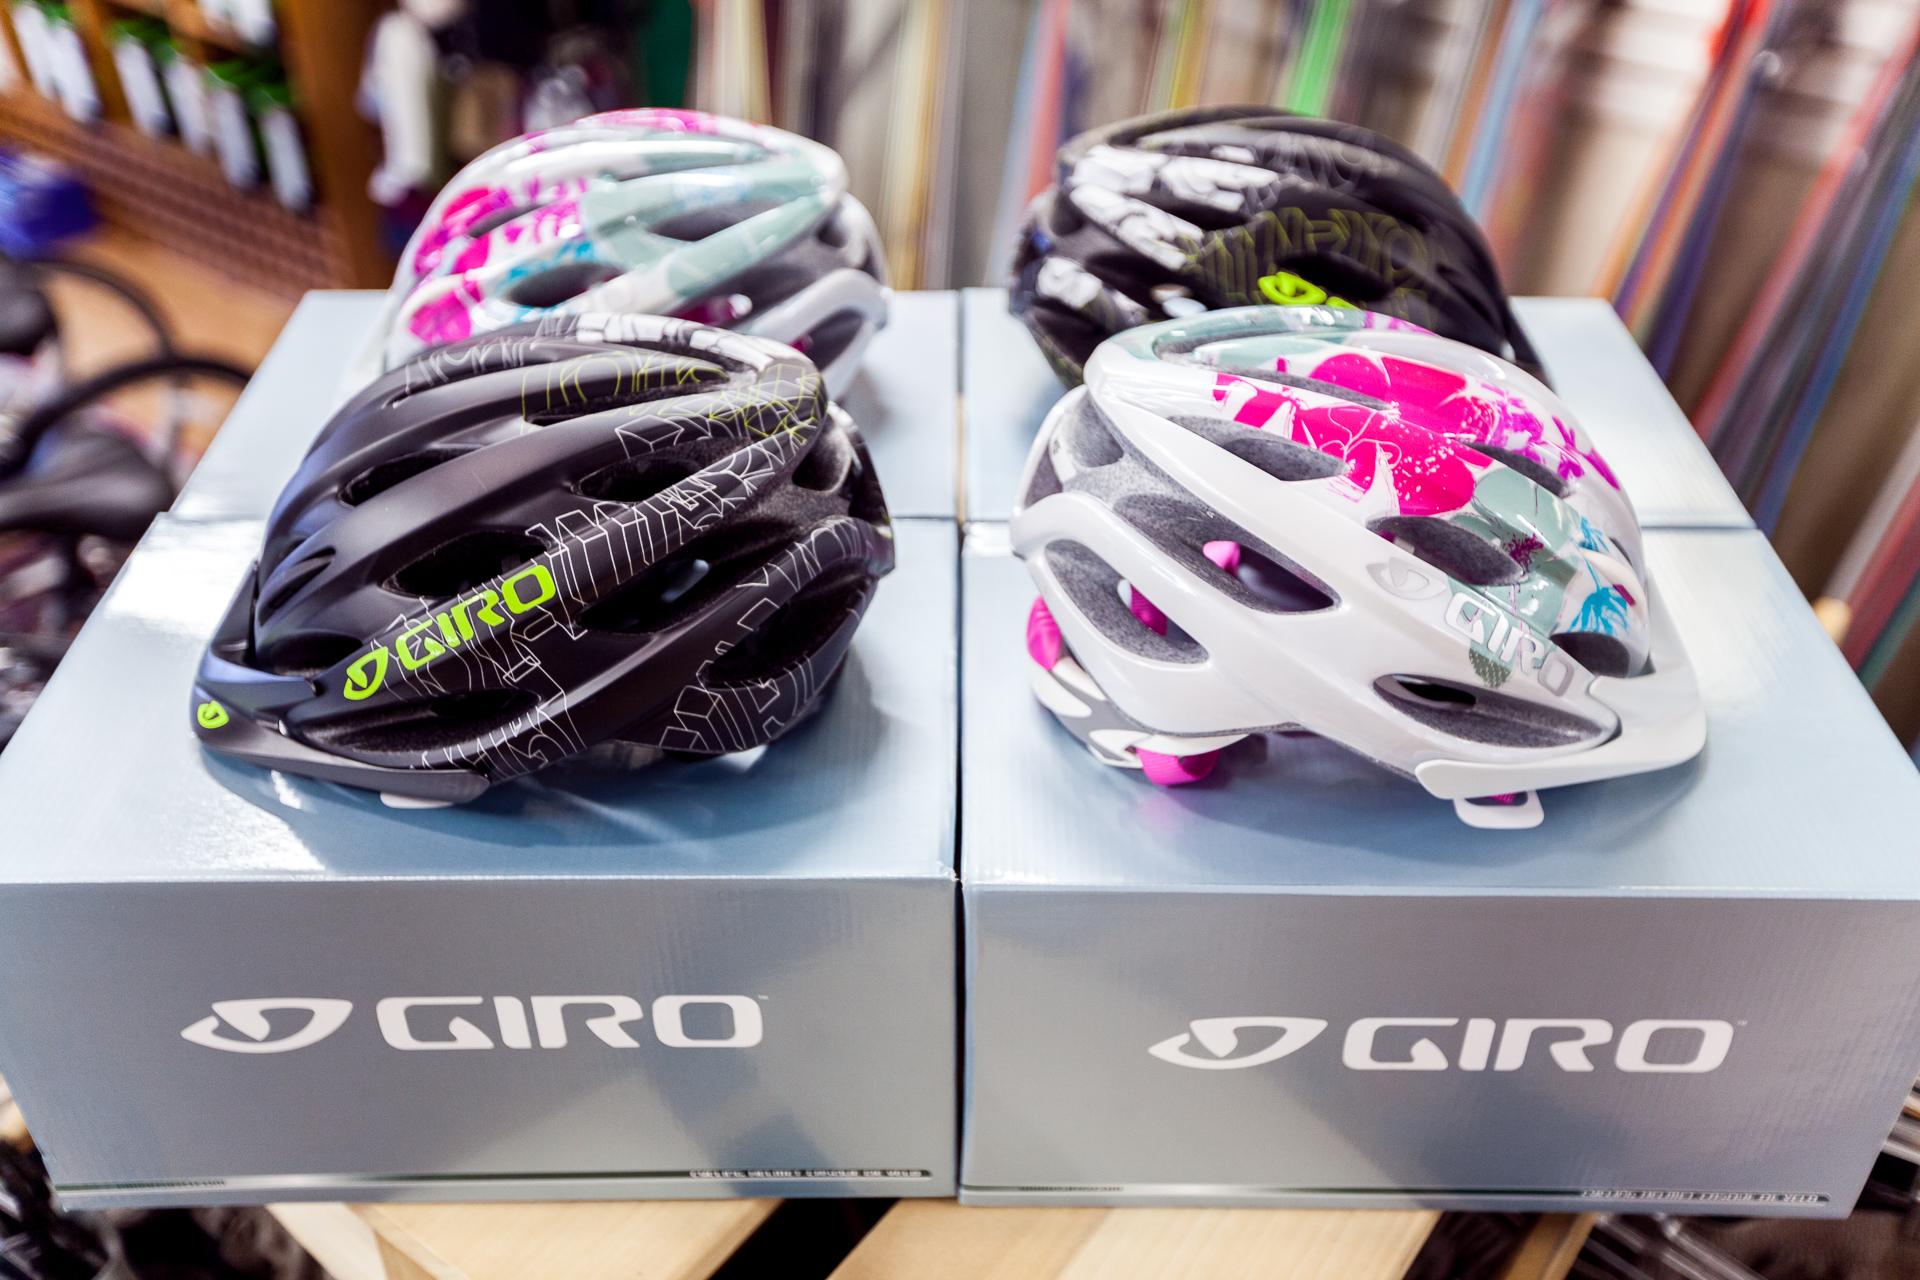 old_town_sports_novato_bike_ski_and_snowboard_shop_giro_helmets.jpg